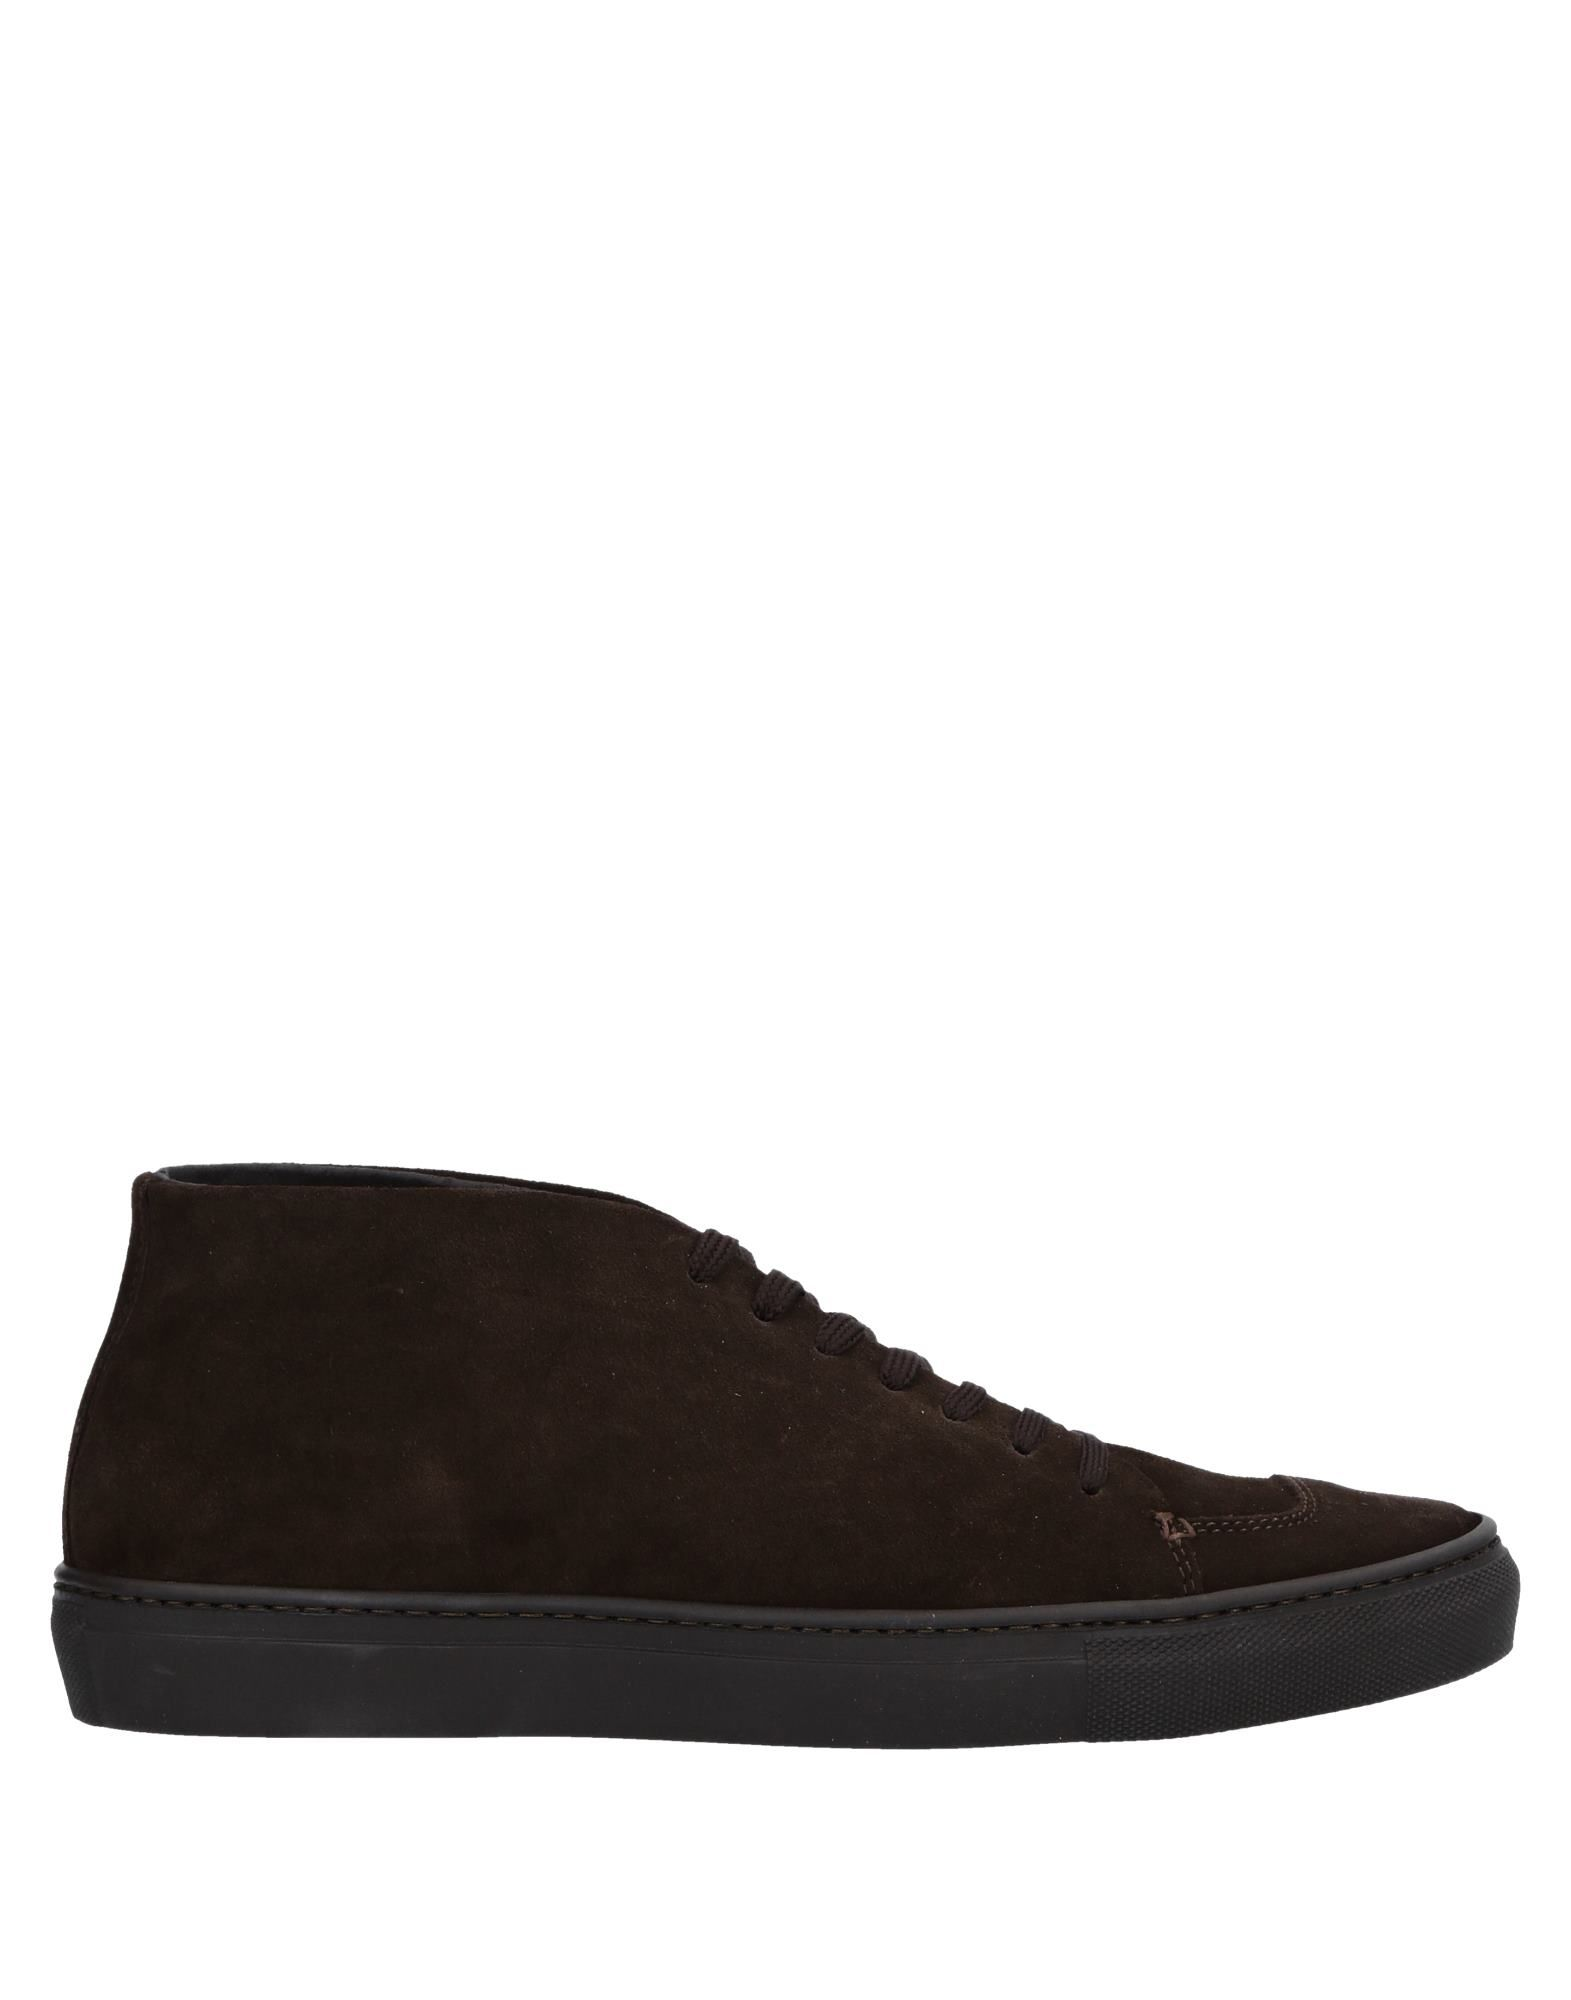 Rabatt echte Schuhe Liu •Jo Man Sneakers Herren  11535397GC